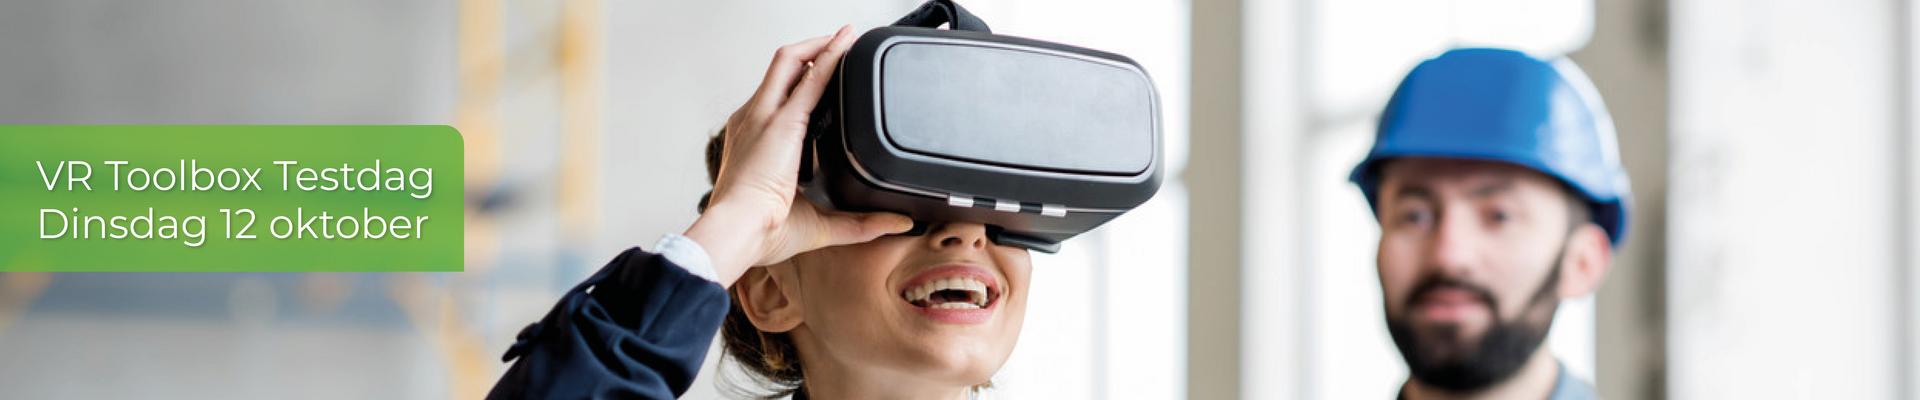 VR Toolbox Testdag